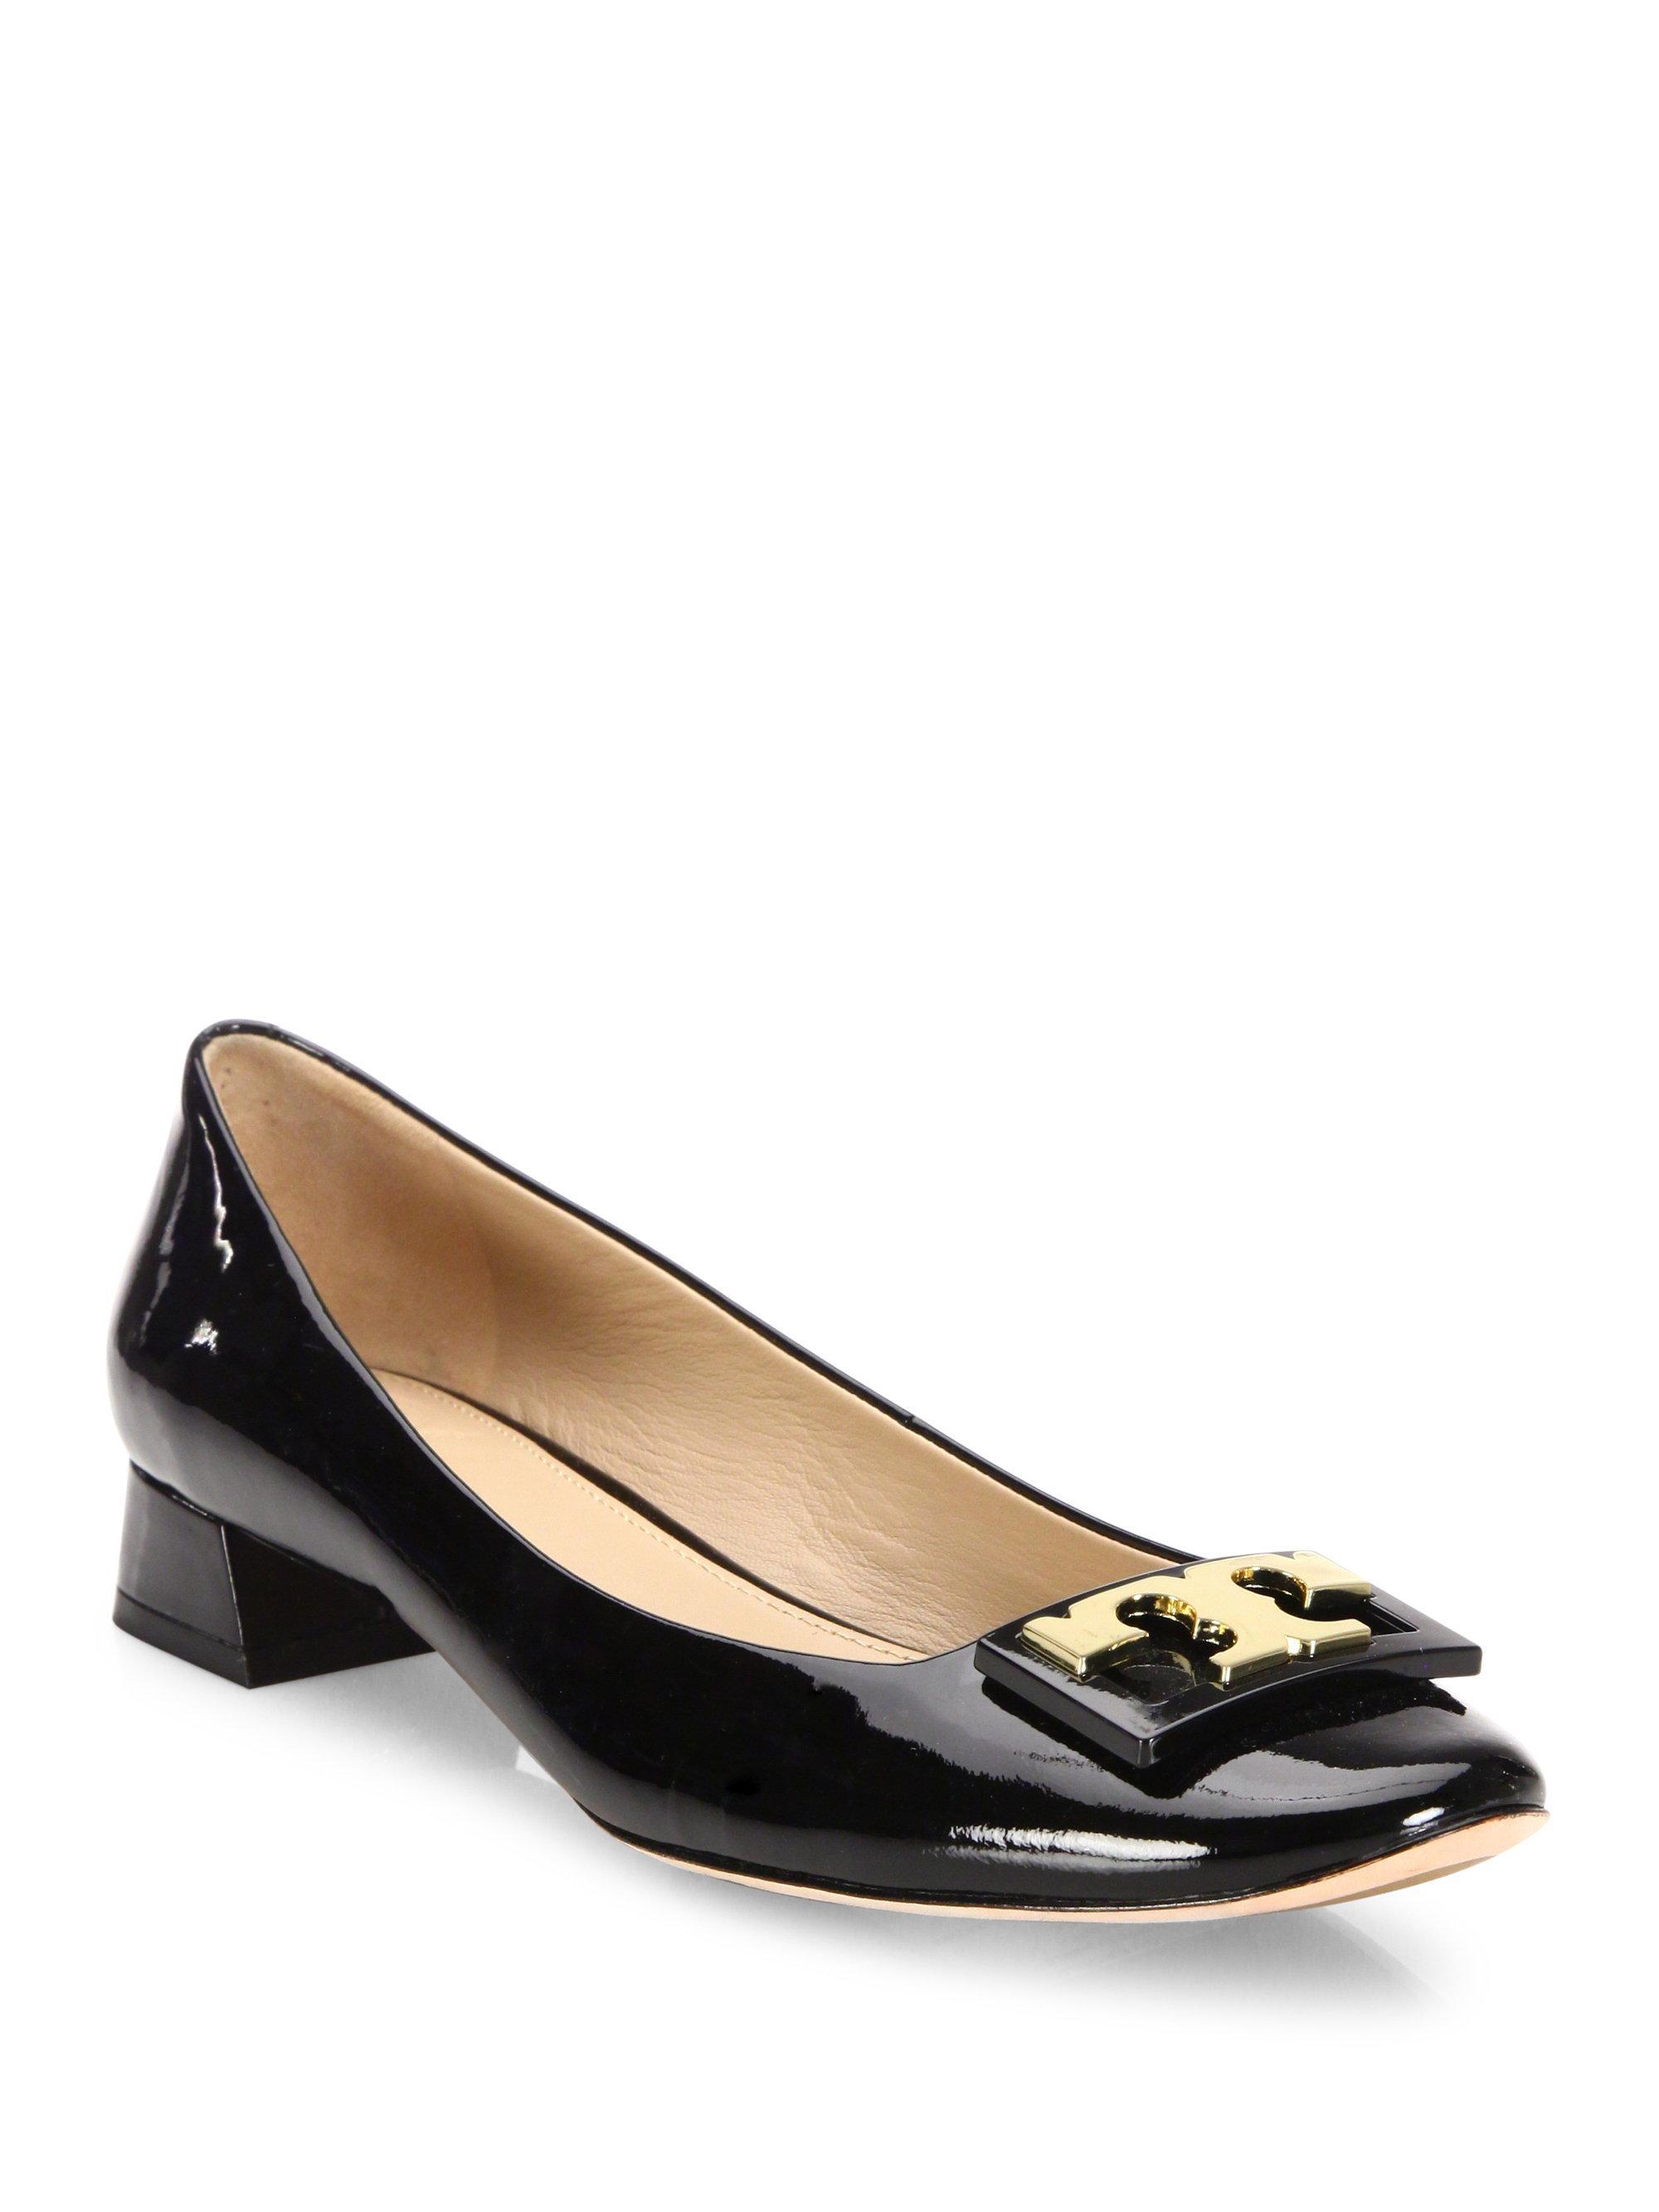 Lyst Tory Burch Gigi Patent Leather Block Heel Pumps In